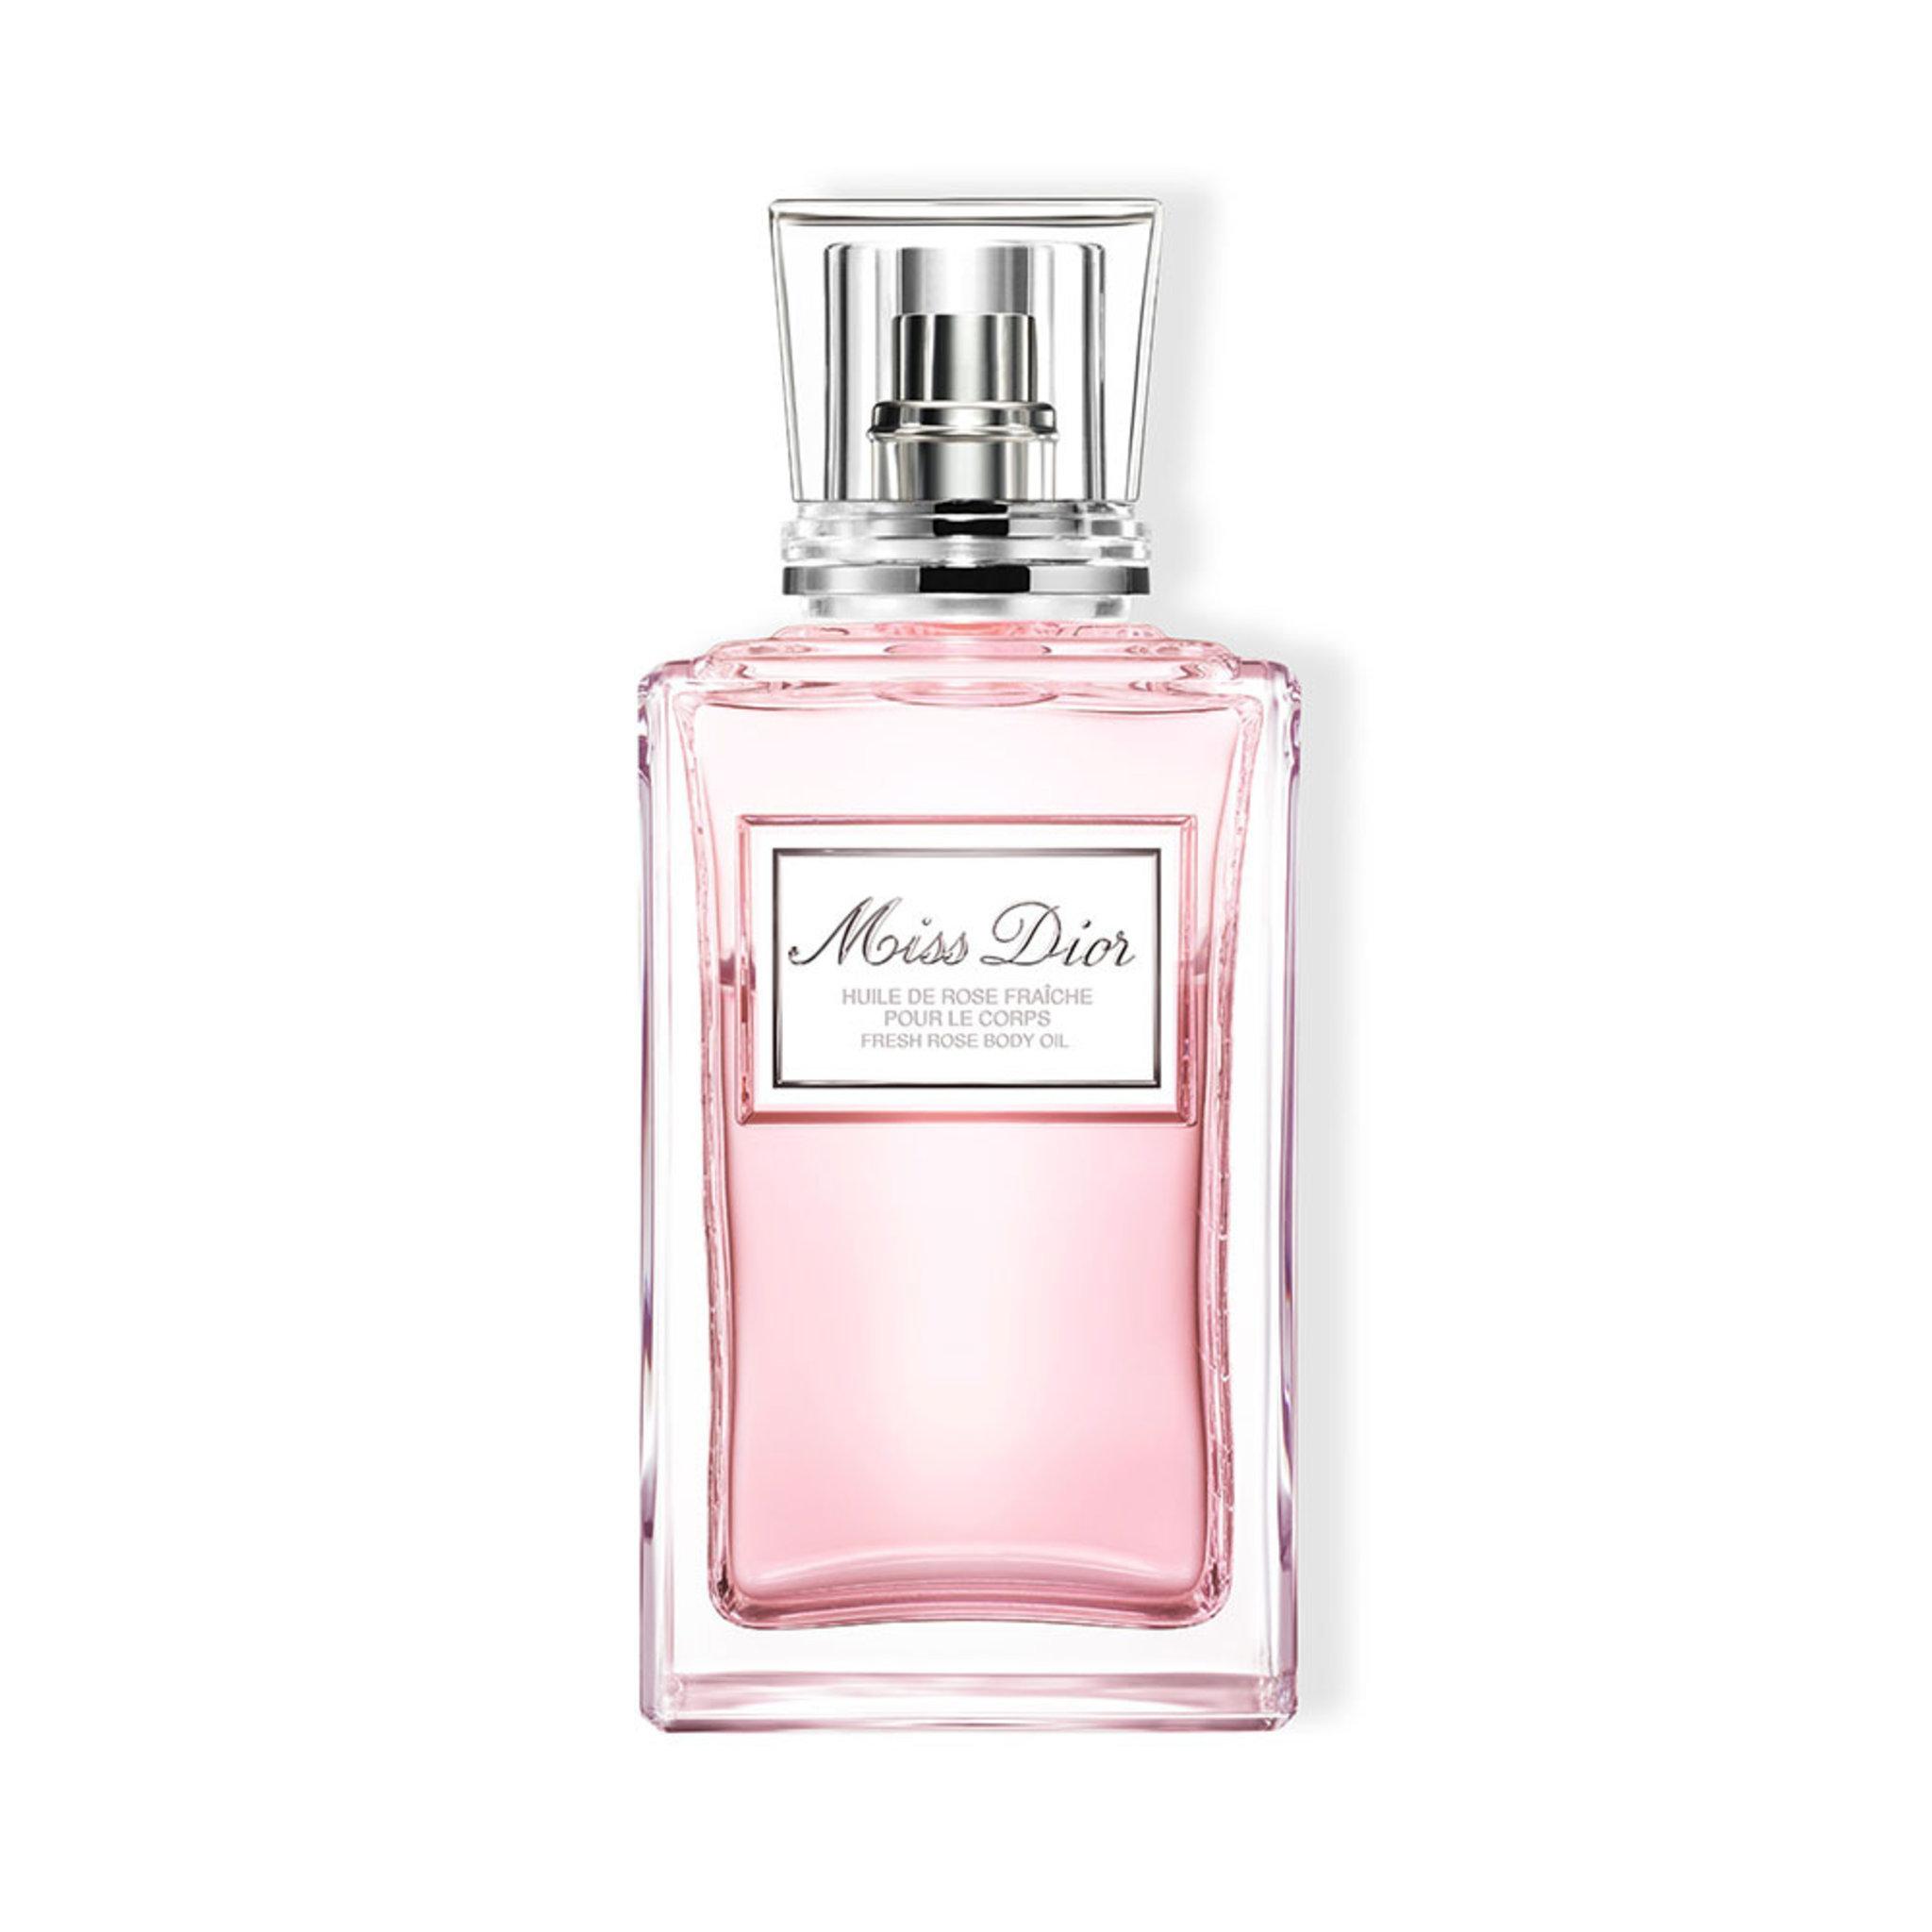 Miss Dior Body Oil, 100 ML